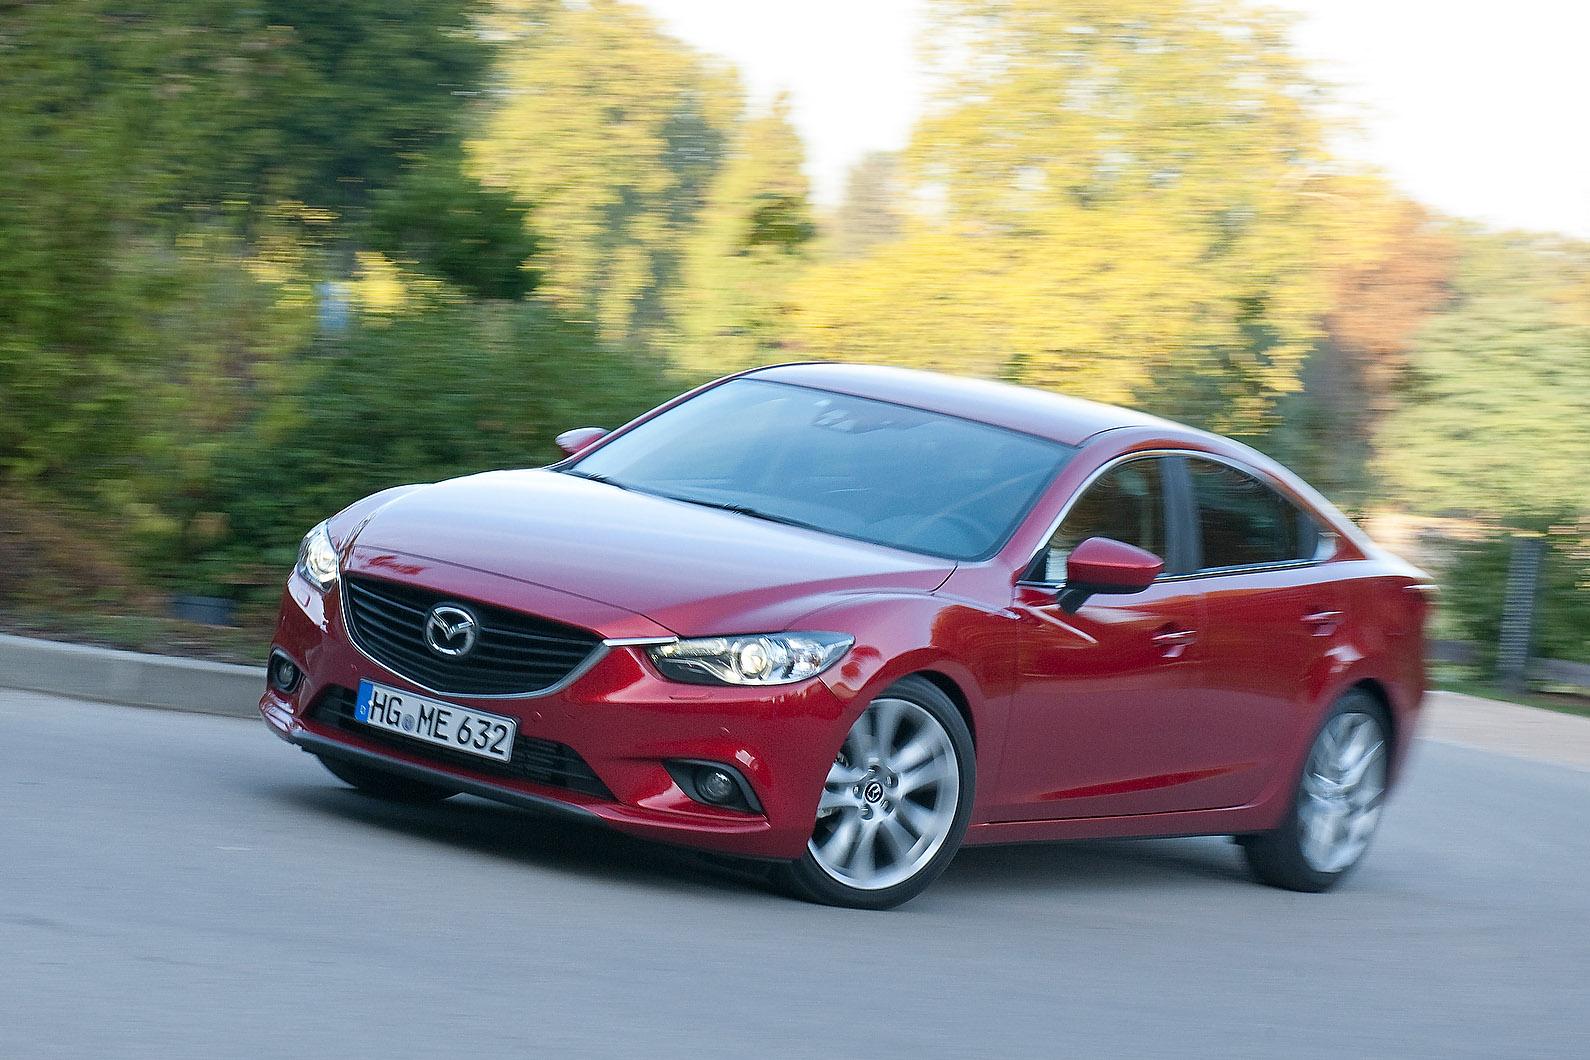 Mazda6 photo #1